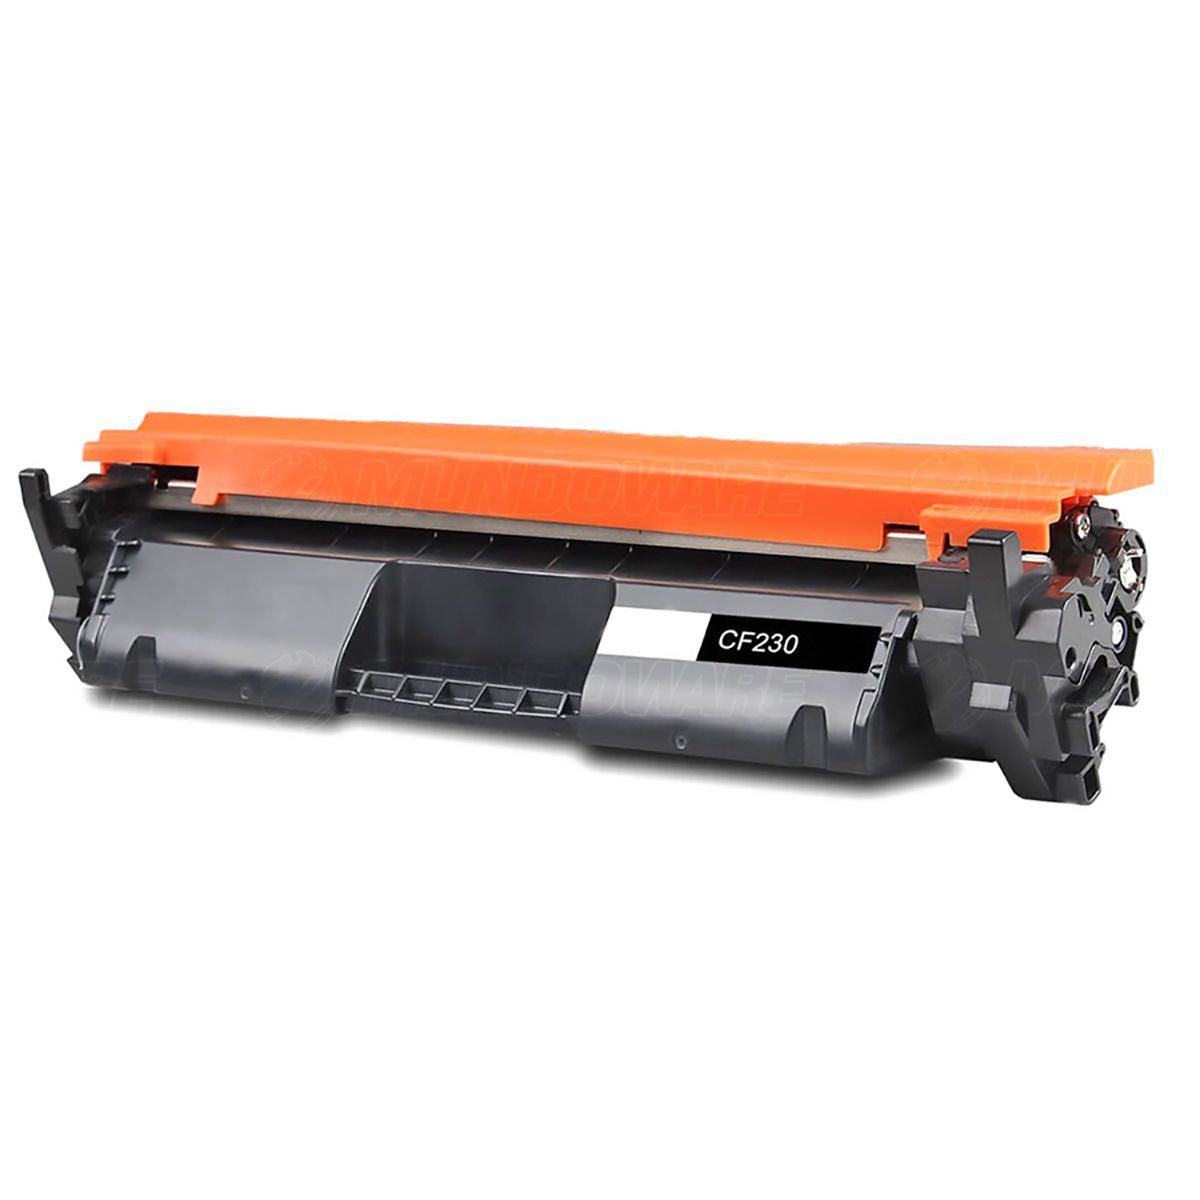 Compatível: Toner CF230X 230X para Impressora HP M227 M227fdn M227fdw M203 M203d M203dn M203dw 227fdw / Preto / 3.500